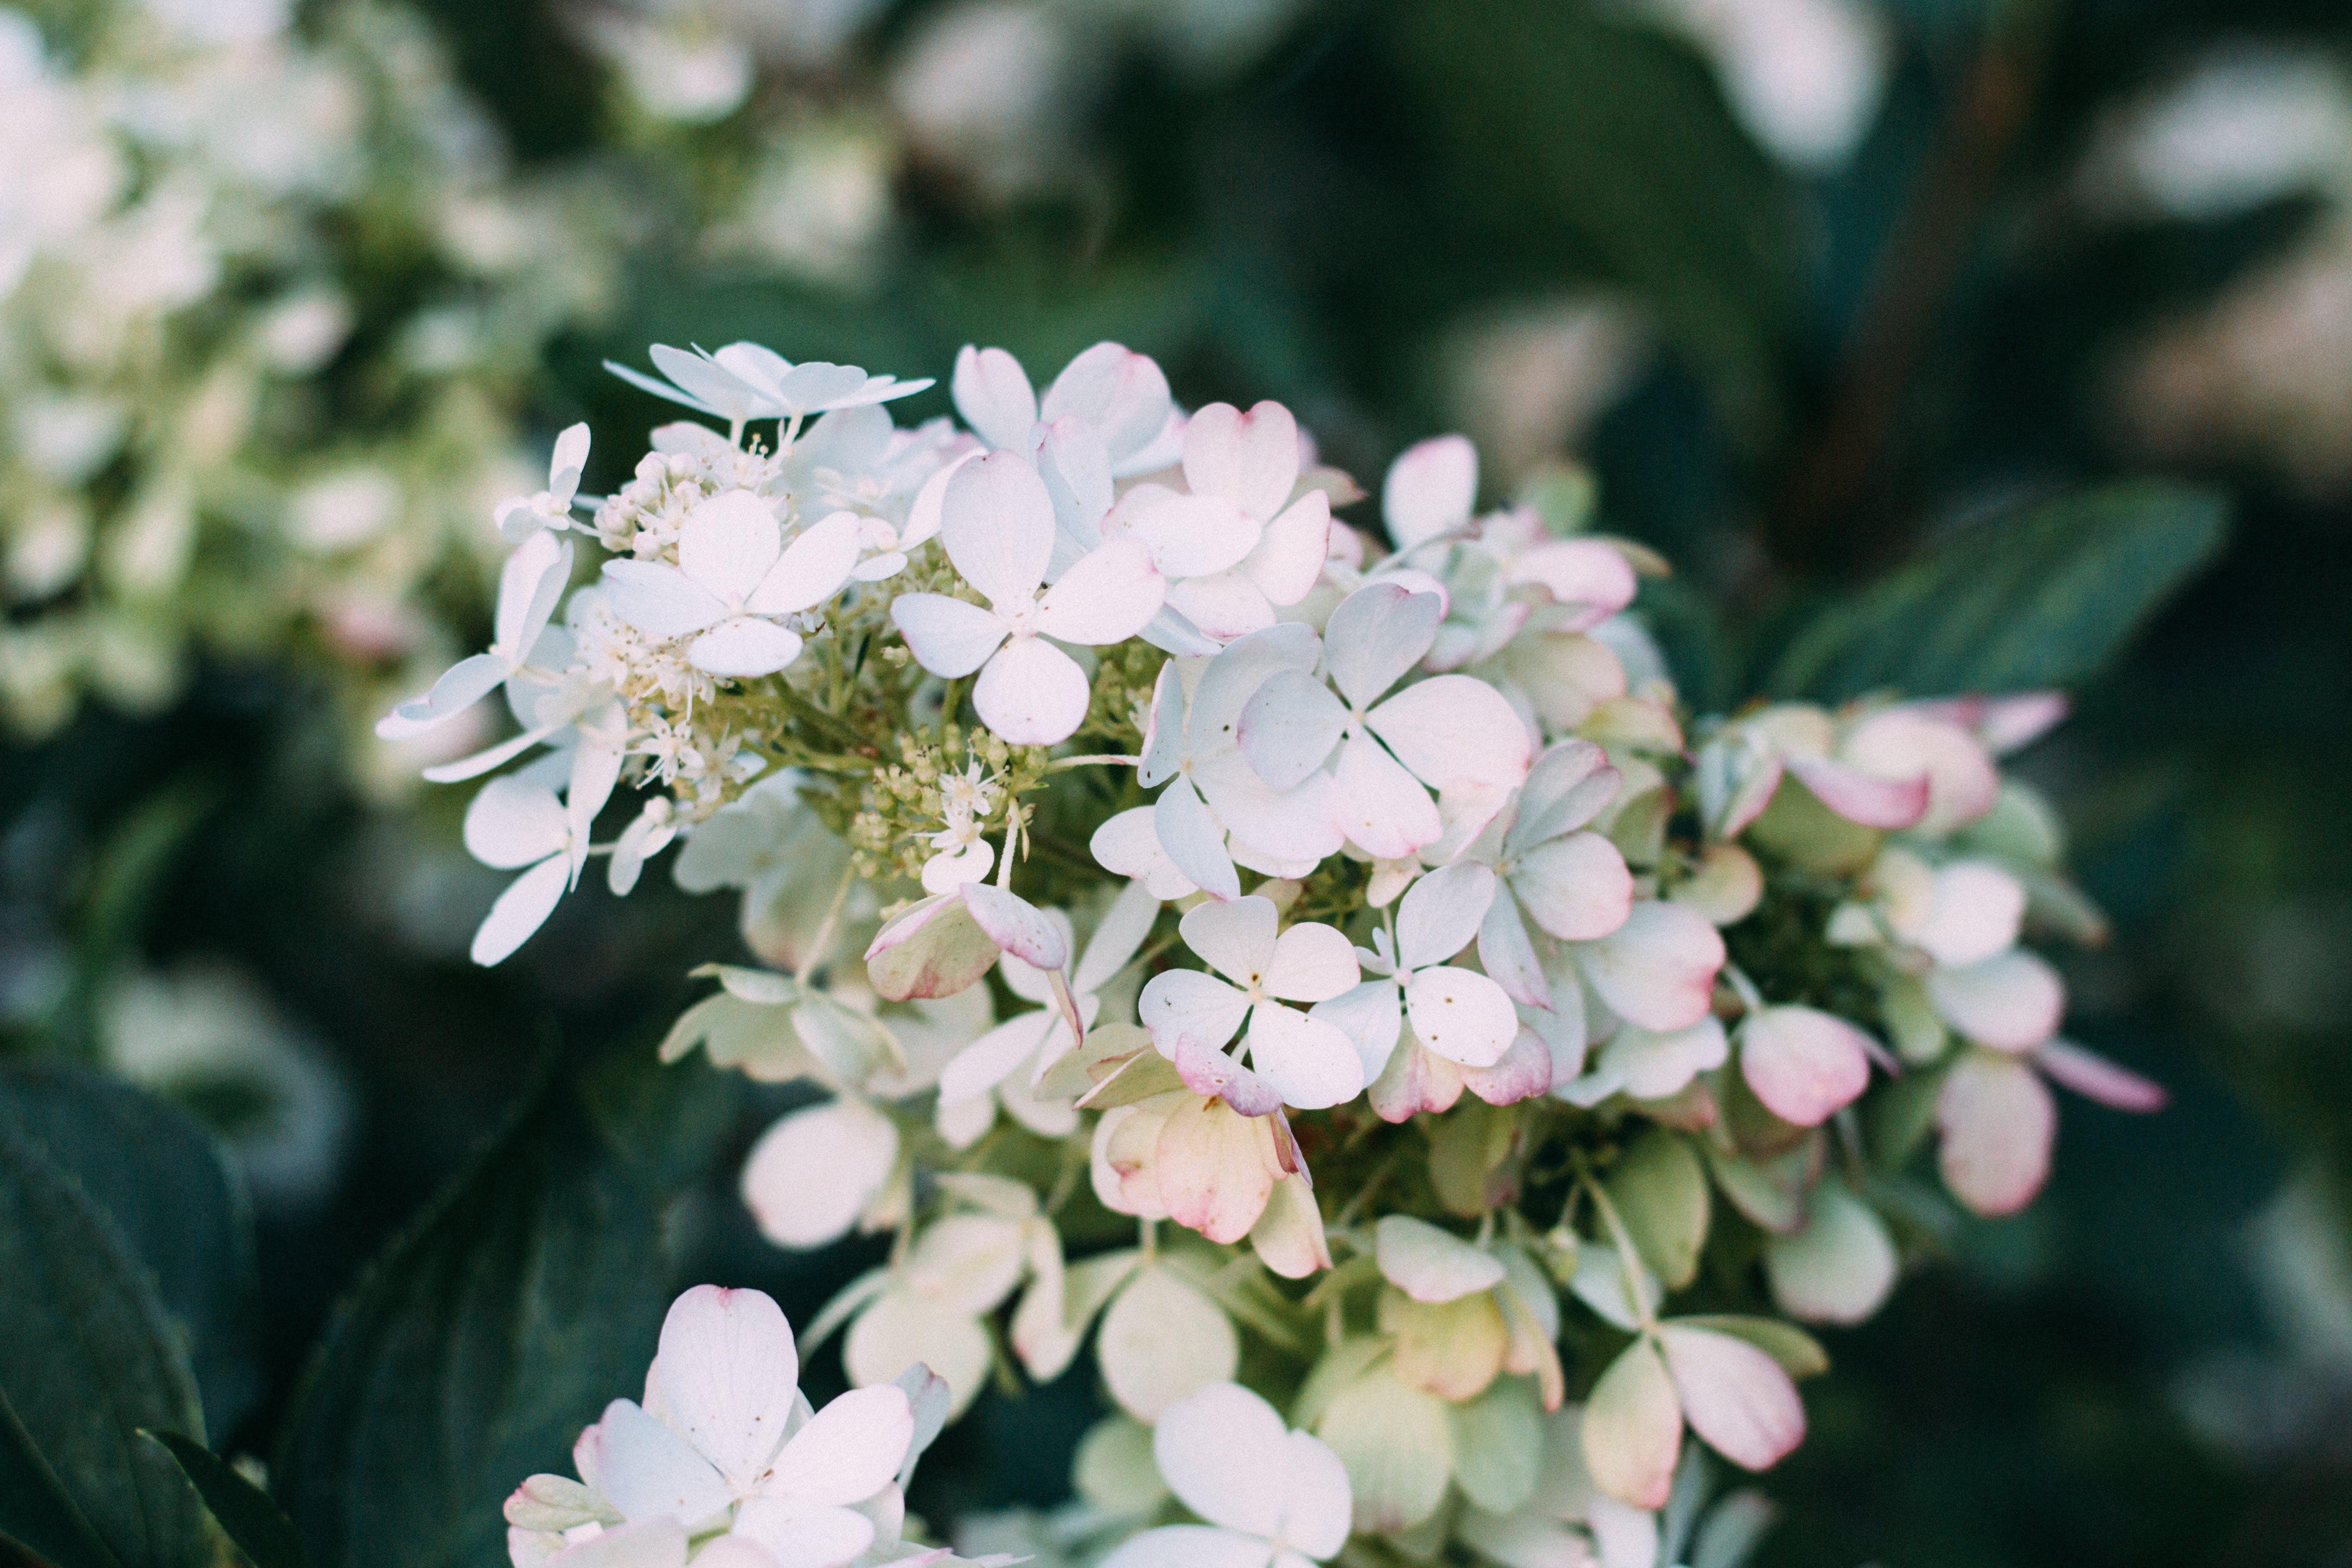 Closeup Photo of White Hydrangea Flowers